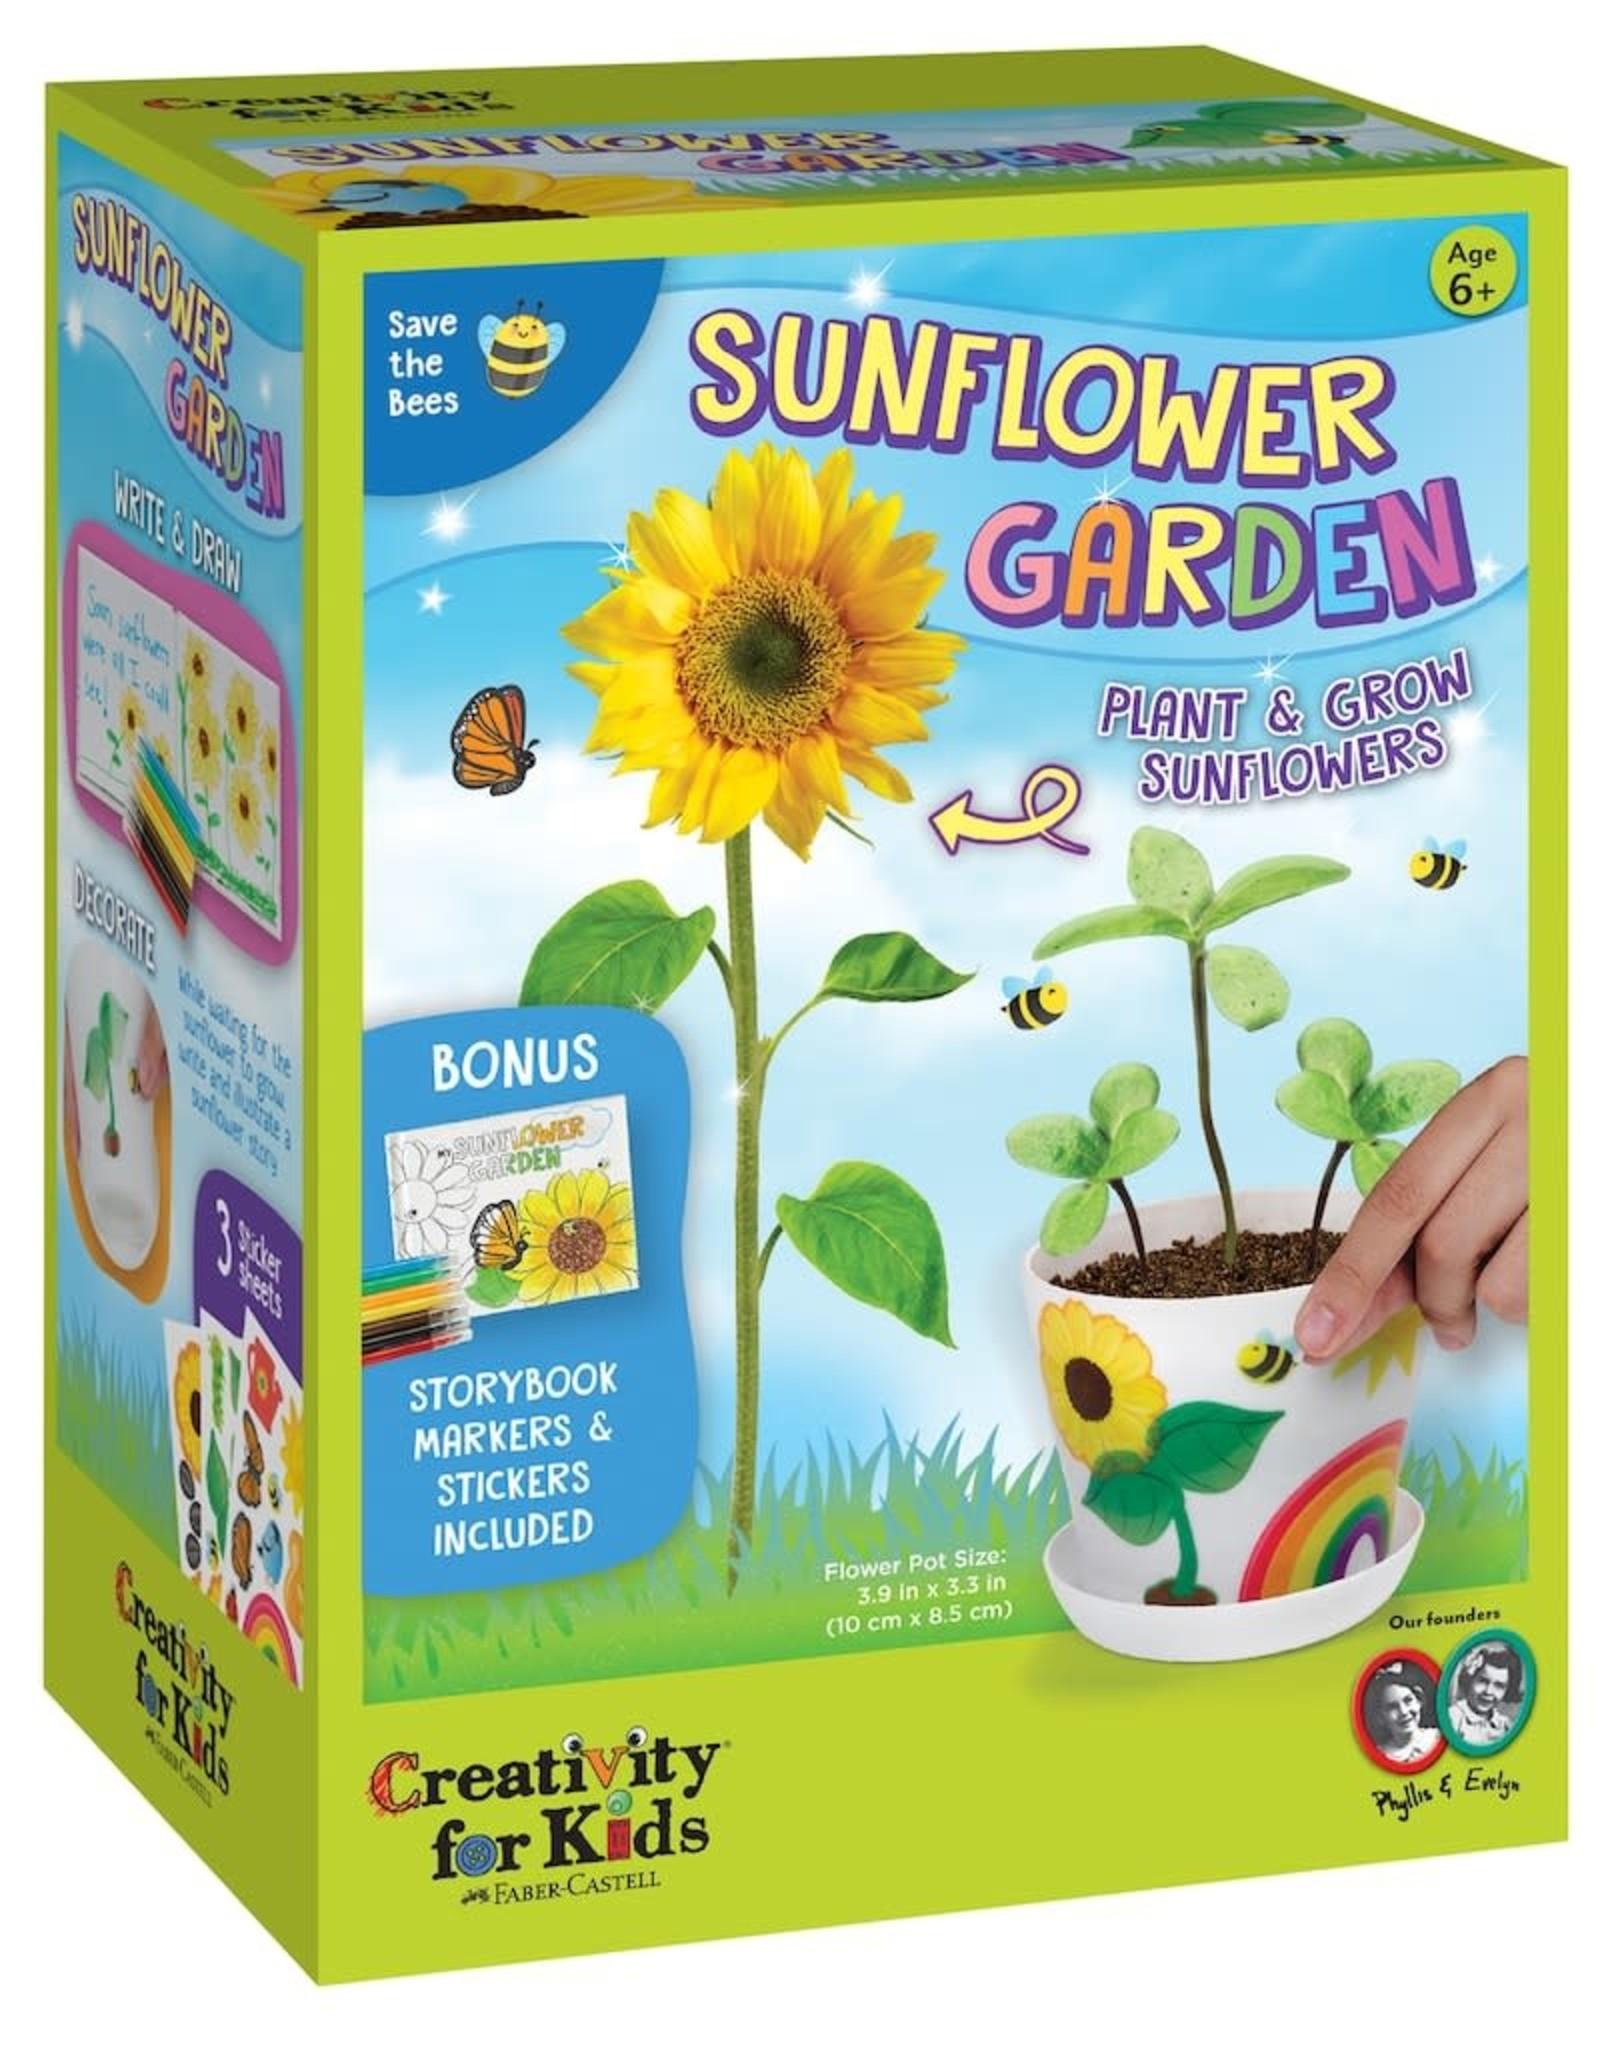 Creativity For Kids Sunflower Garden